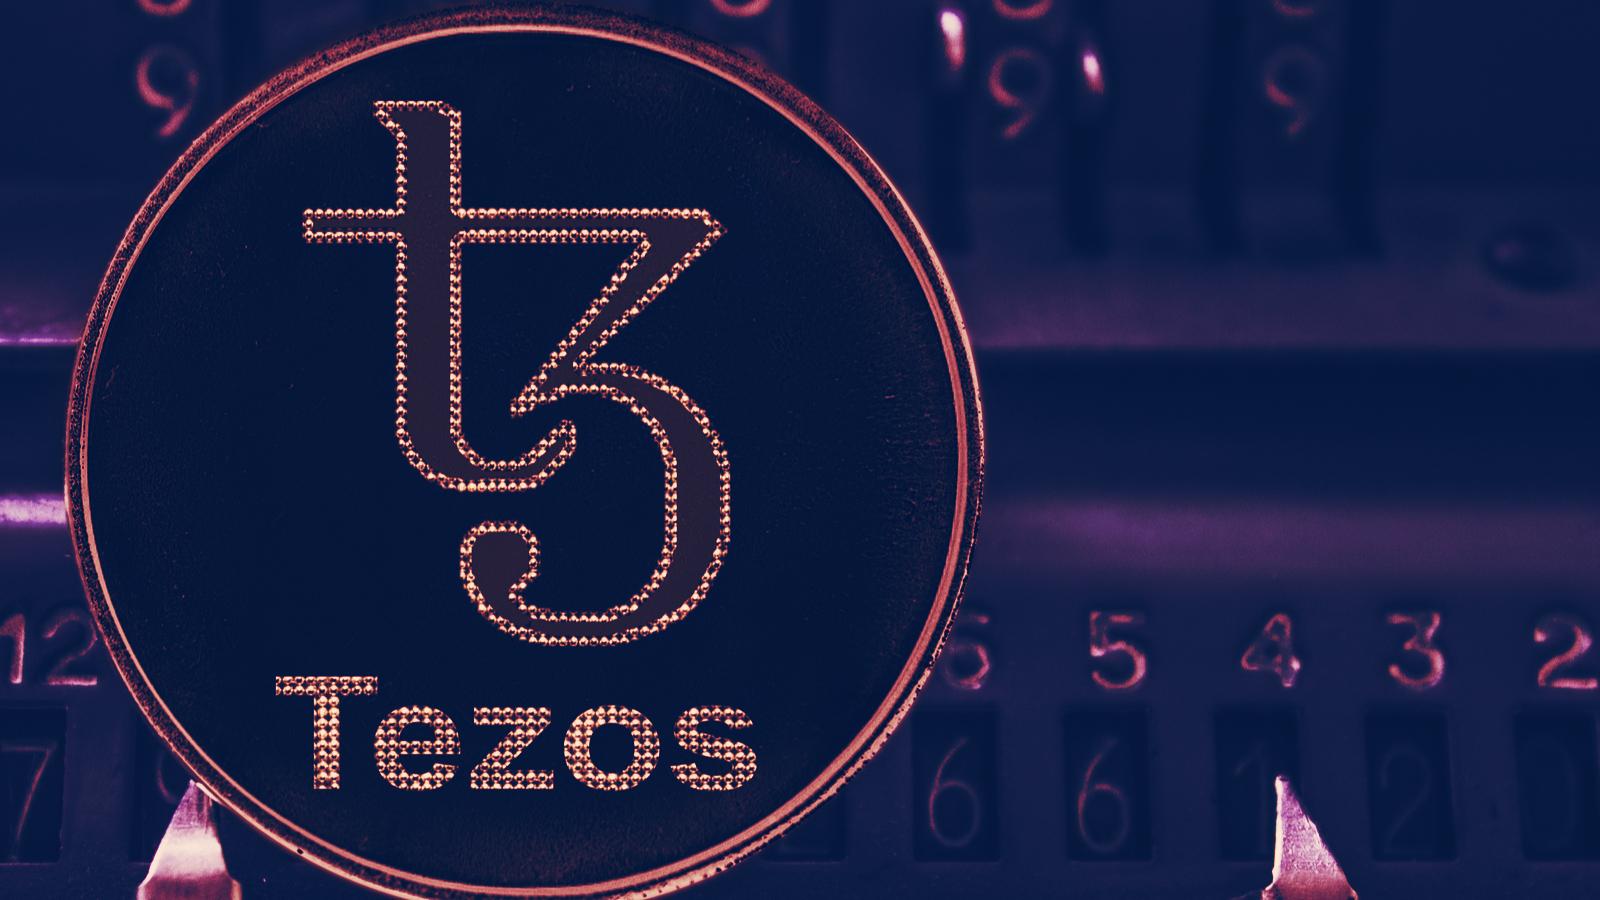 Tezos and Cosmos Rally as Wider Crypto Market Stagnates